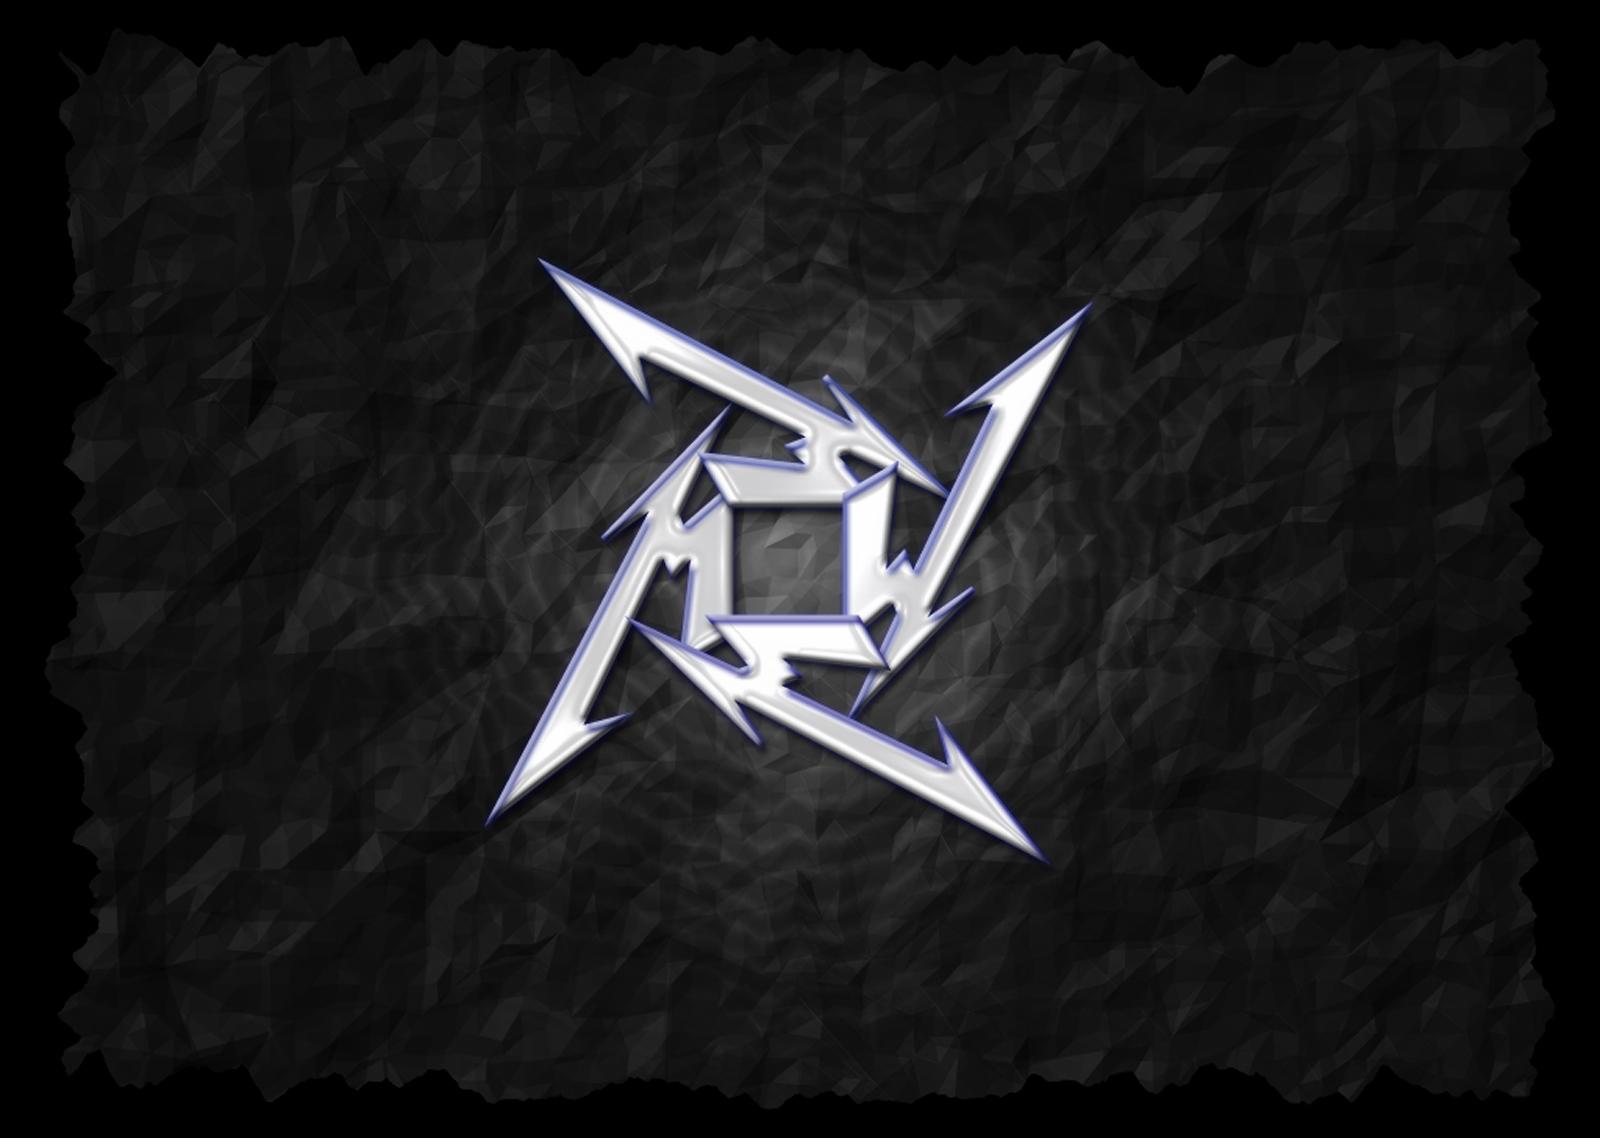 Glock Logo Desktop httpwwwpic2flycomGlockLogoDesktophtml 1600x1138